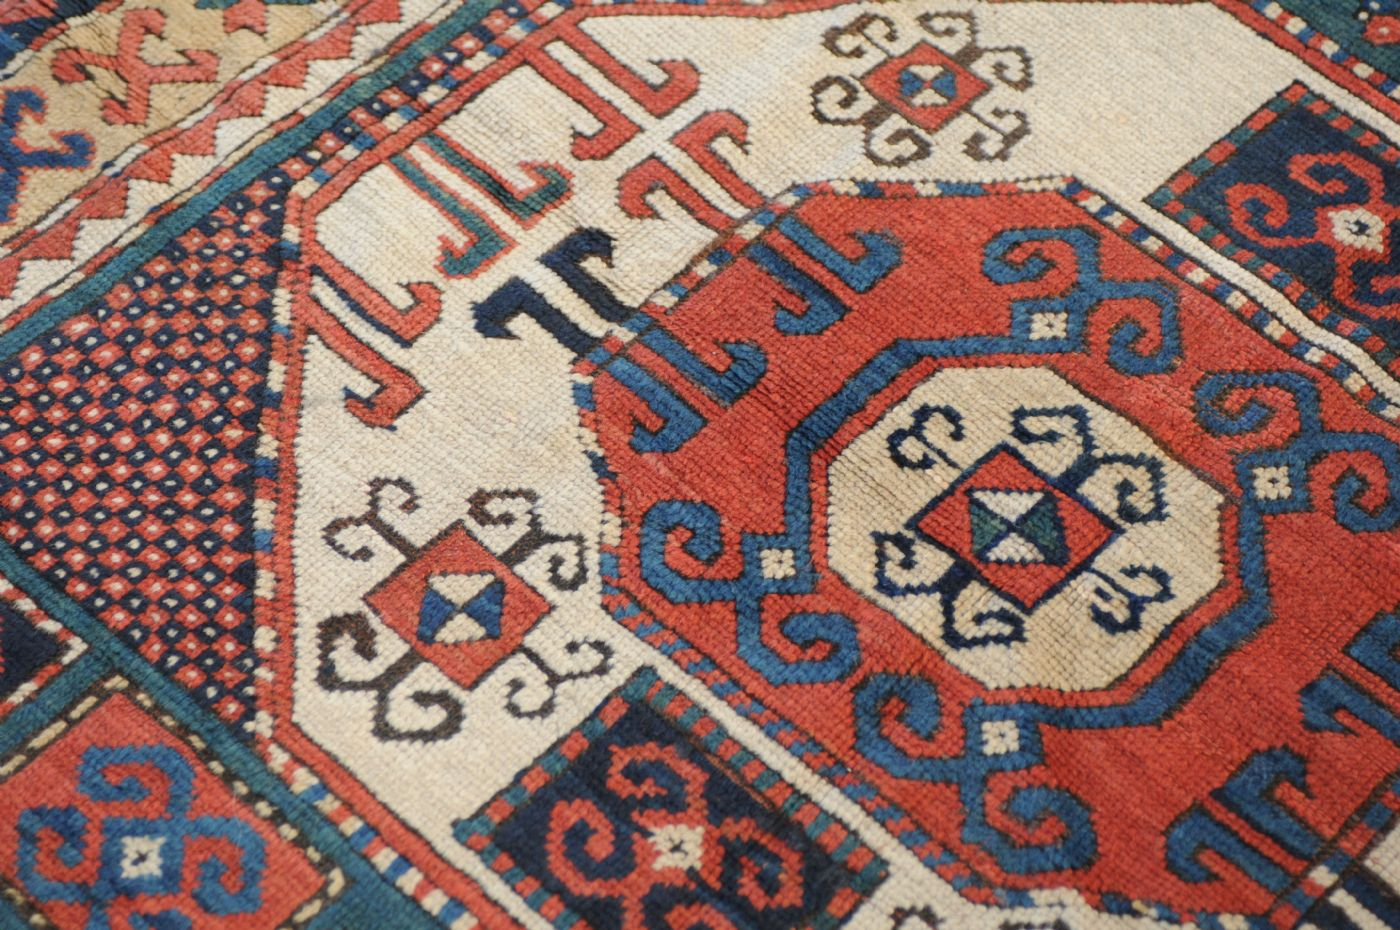 thumb4|Kazakh Karachoph – 19th century – antique piece – approx. 211 x 137 cm